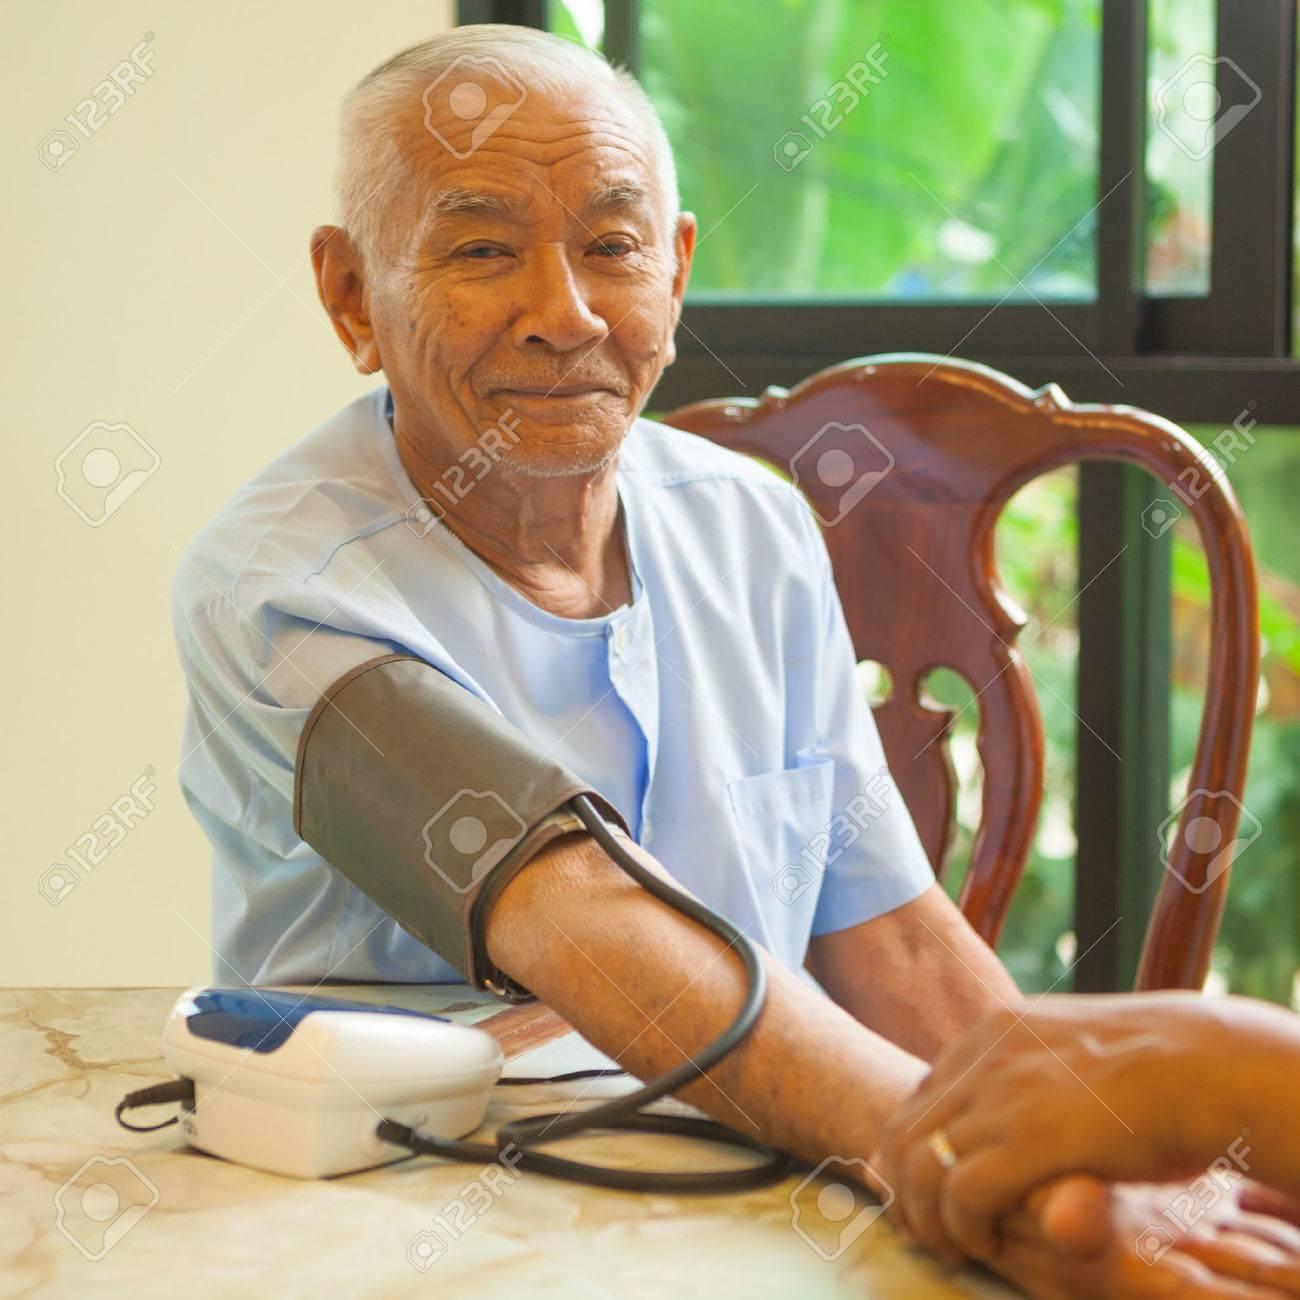 doctor measuring blood pressure of senior asian man patient - 39304867